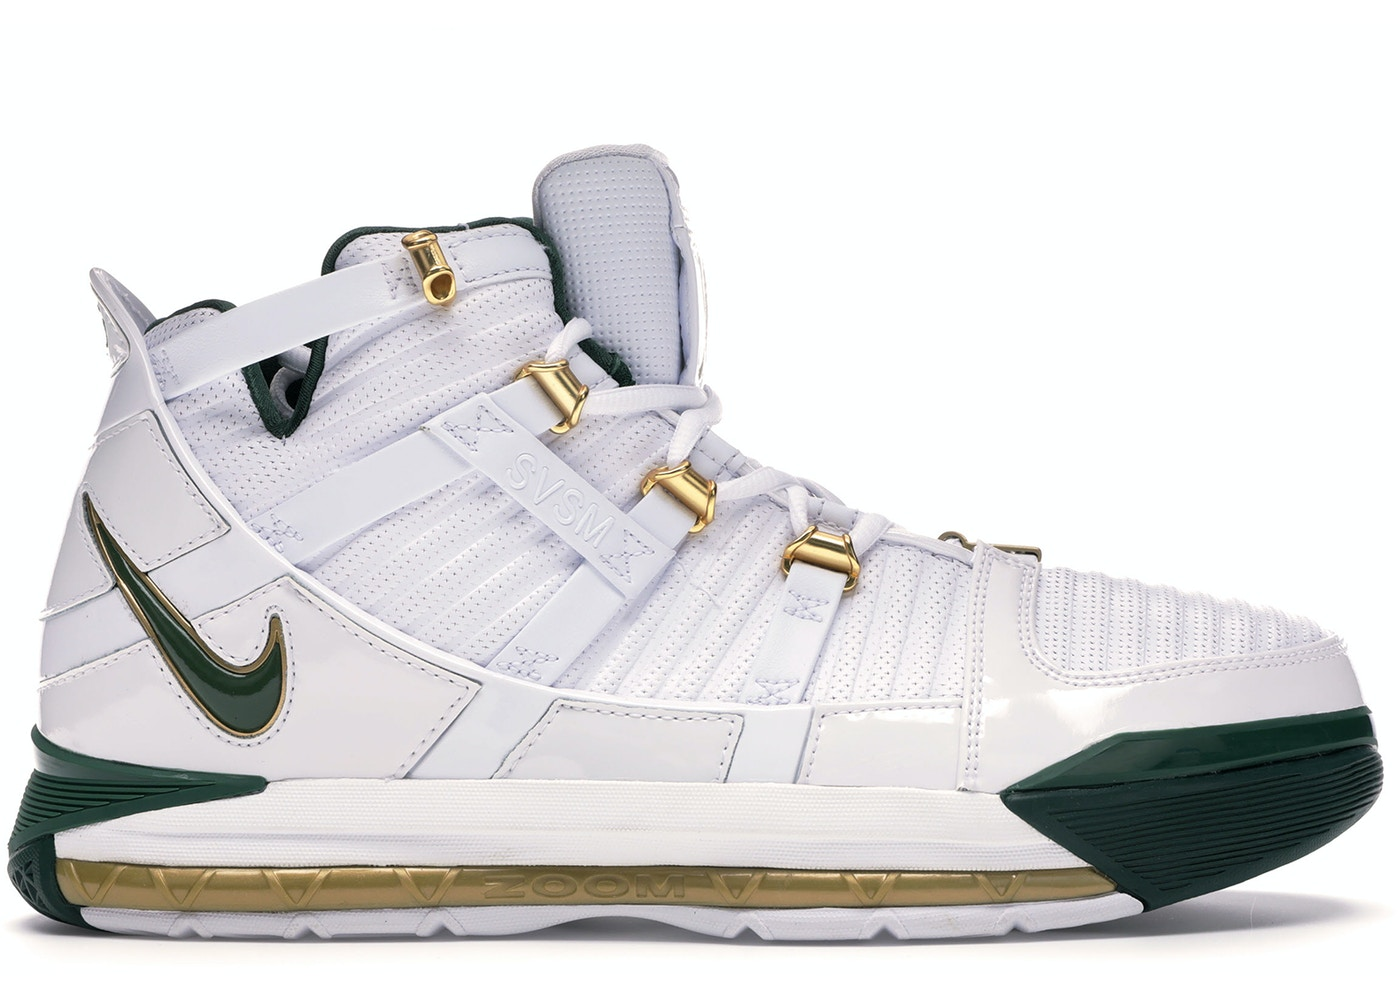 feb51d91def Buy Nike LeBron Shoes & Deadstock Sneakers